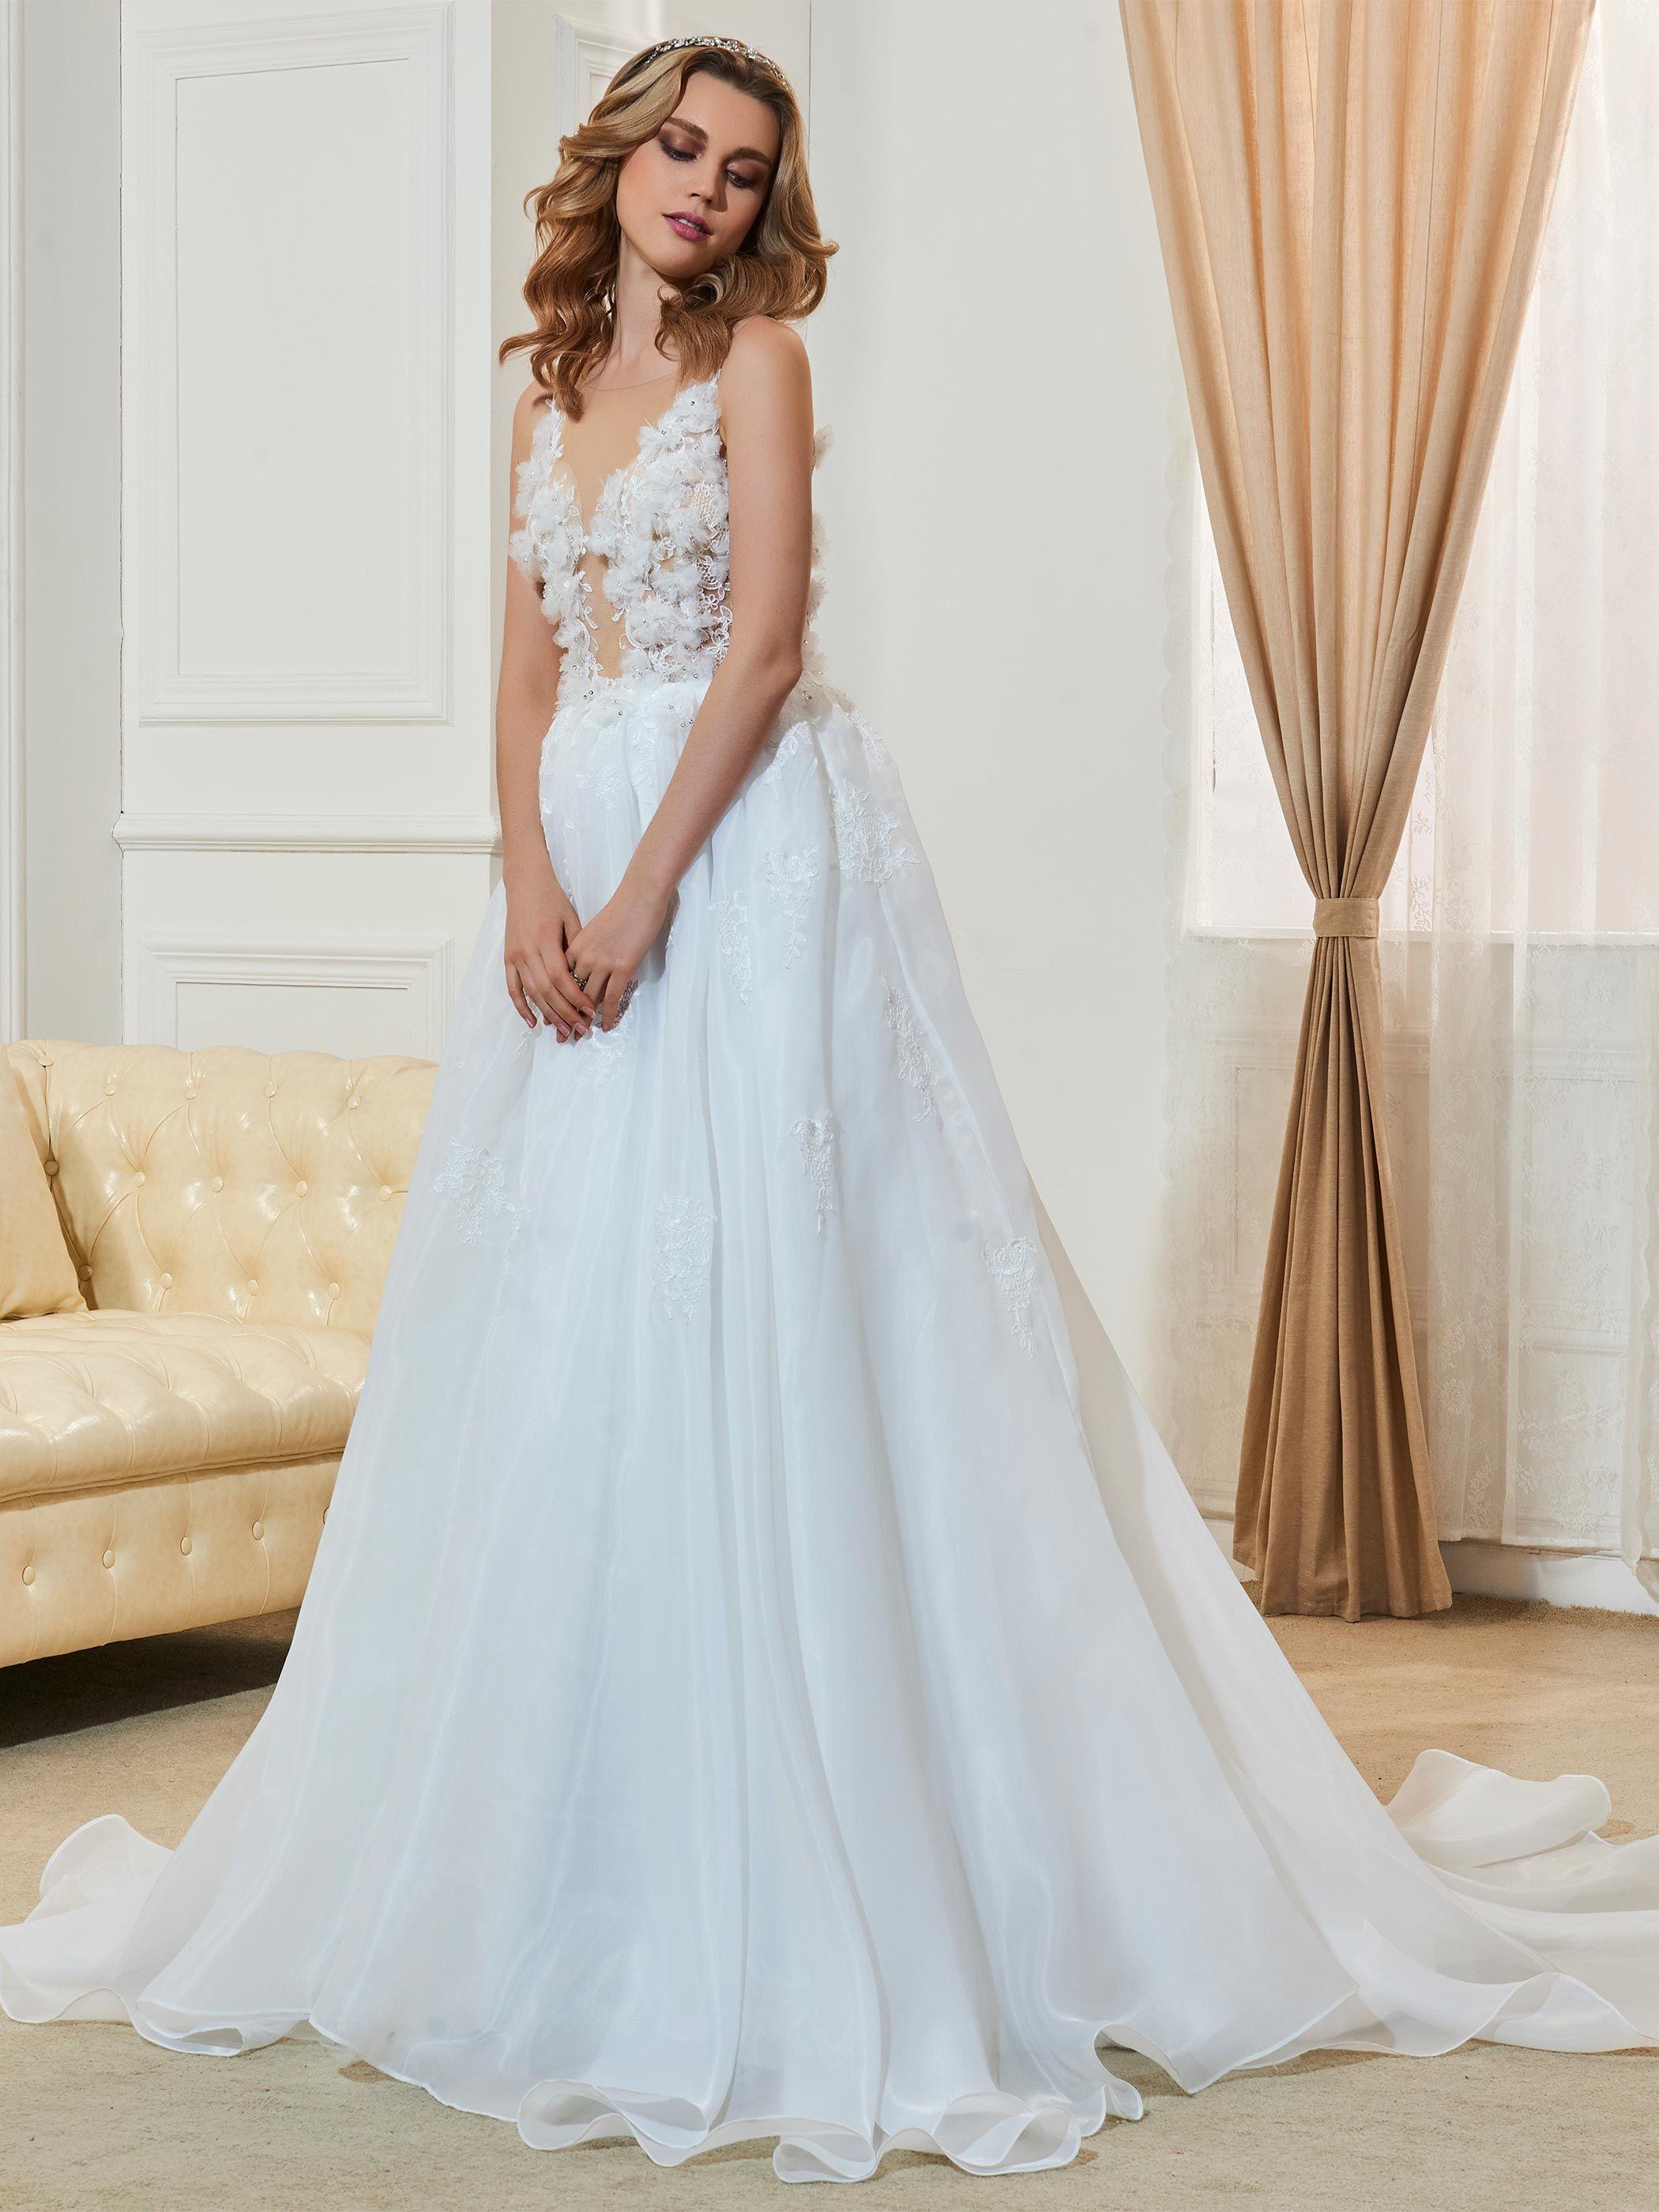 Beautiful Illusion Neckline Flowers A Line Wedding Dress | Illusion ...